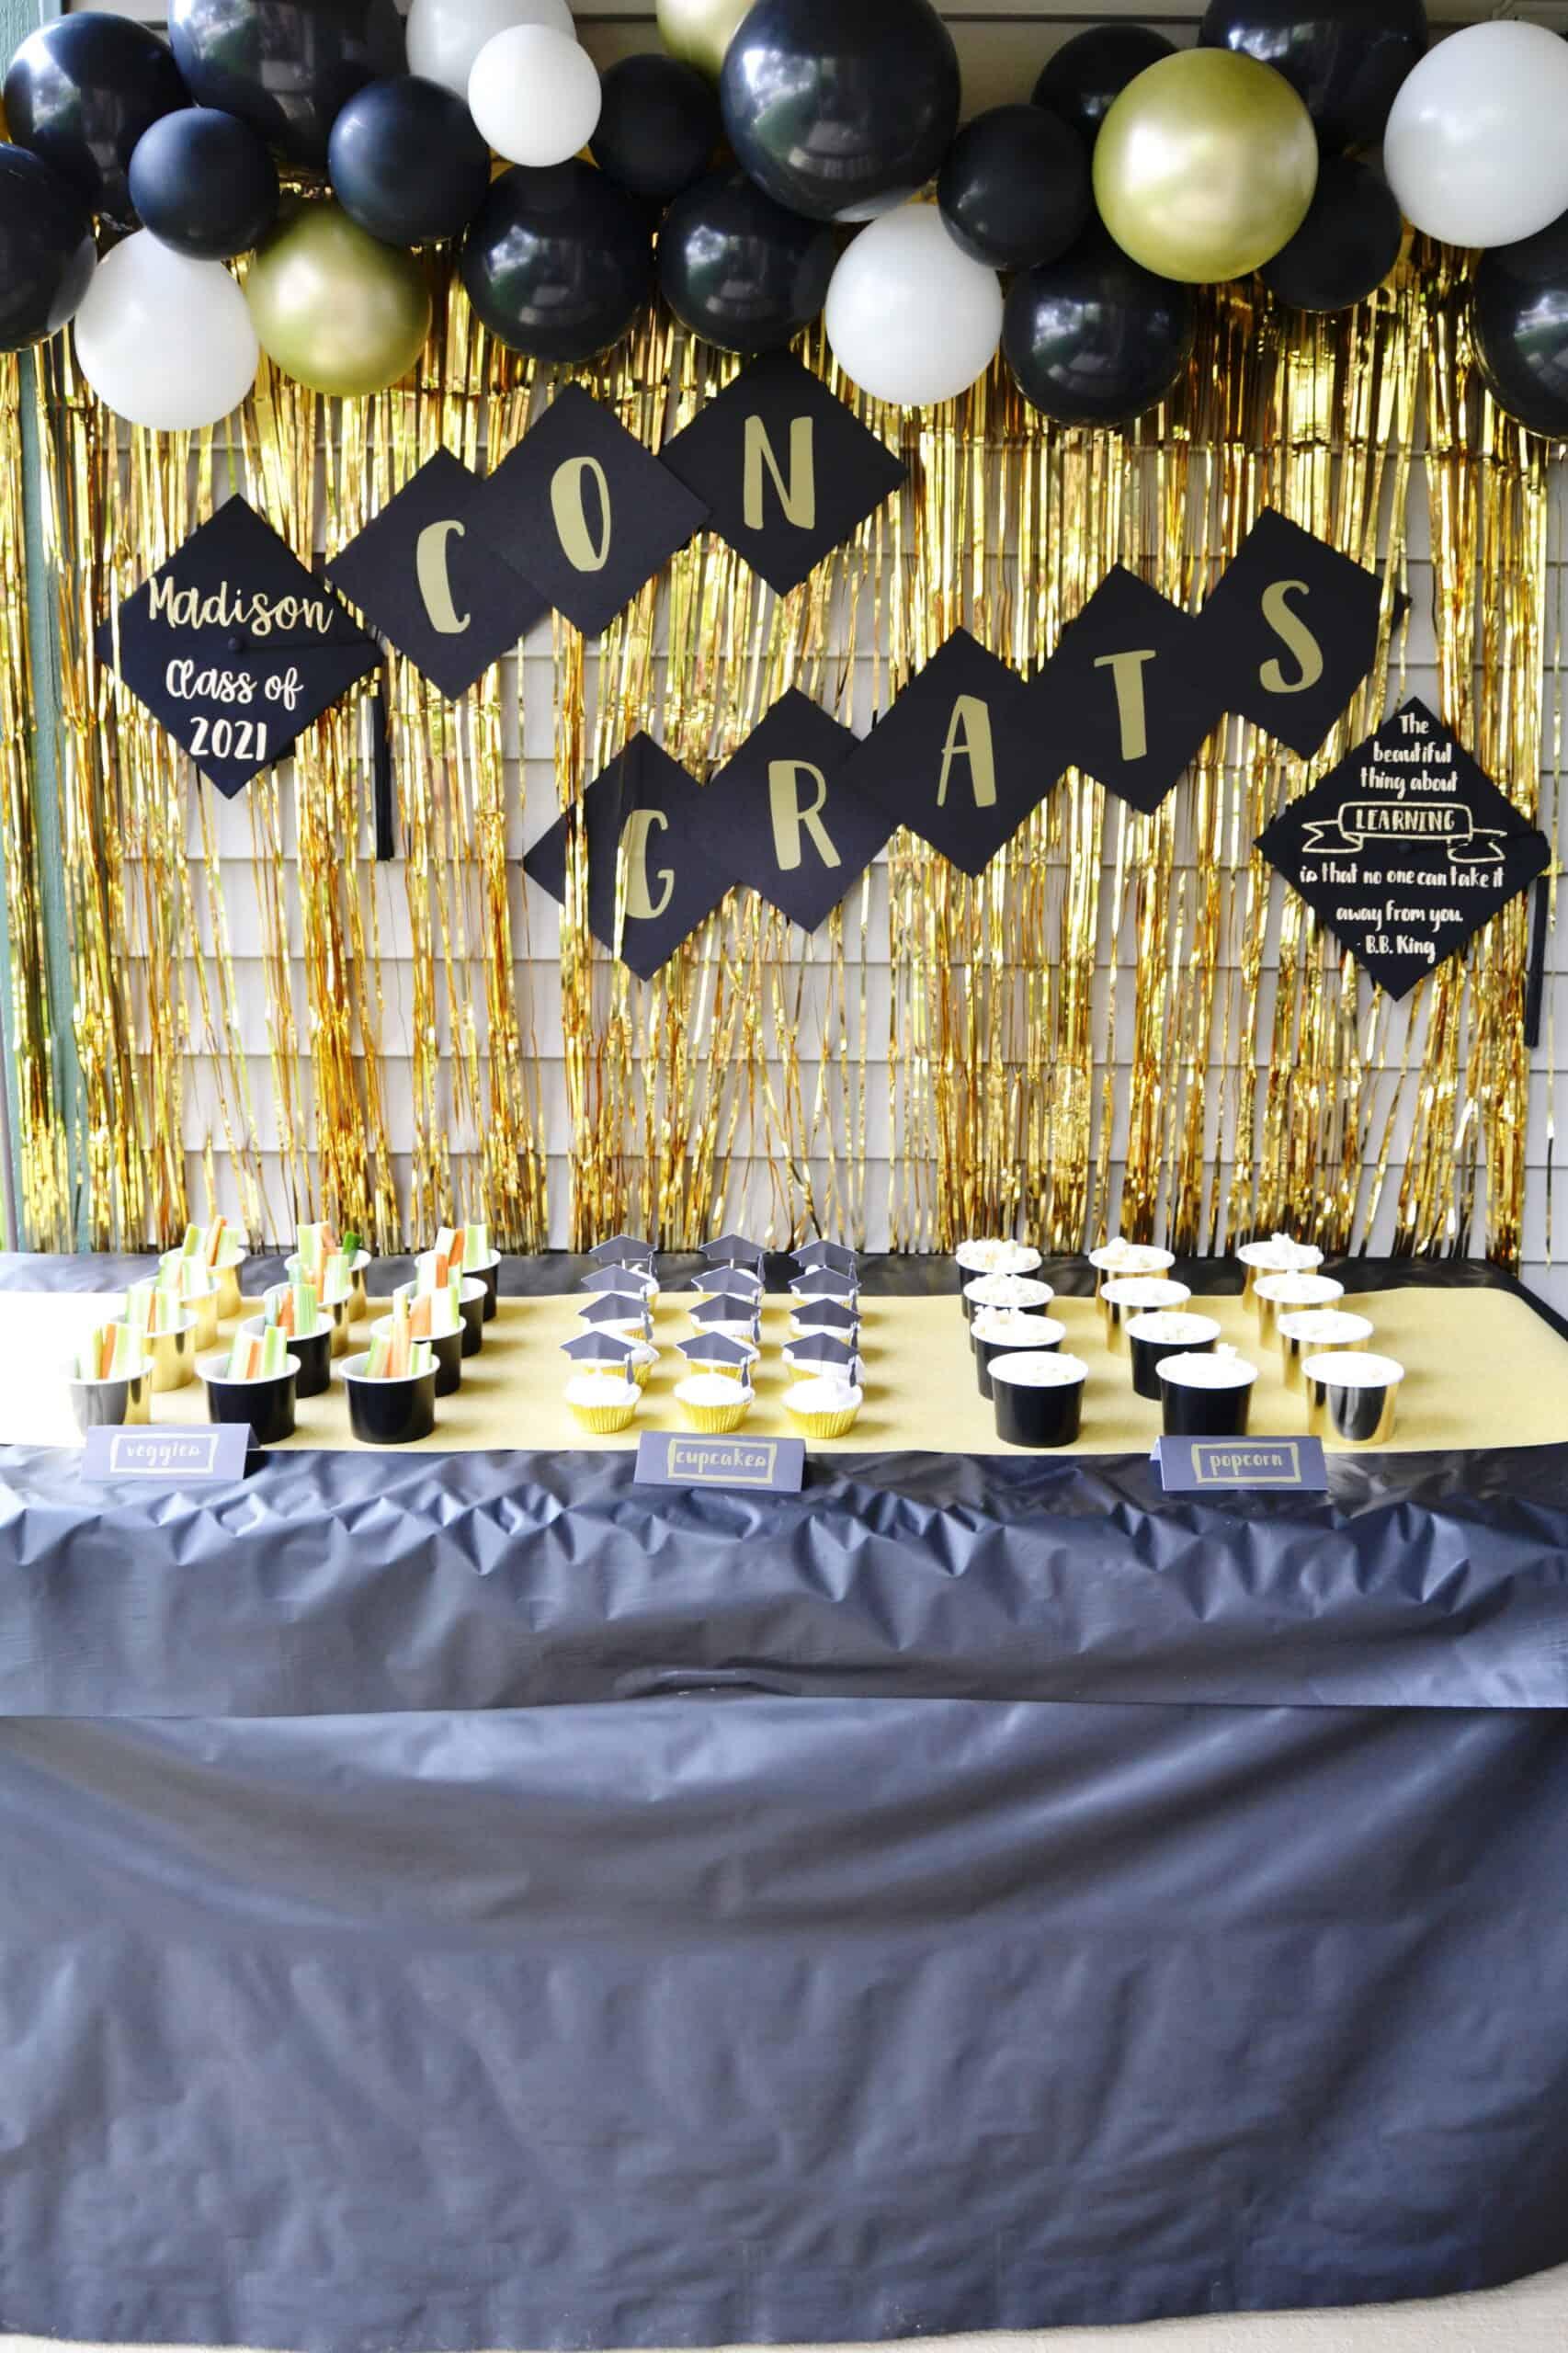 DIY Graduation Party Decorations made with the Cricut Joy including decorated graduation caps